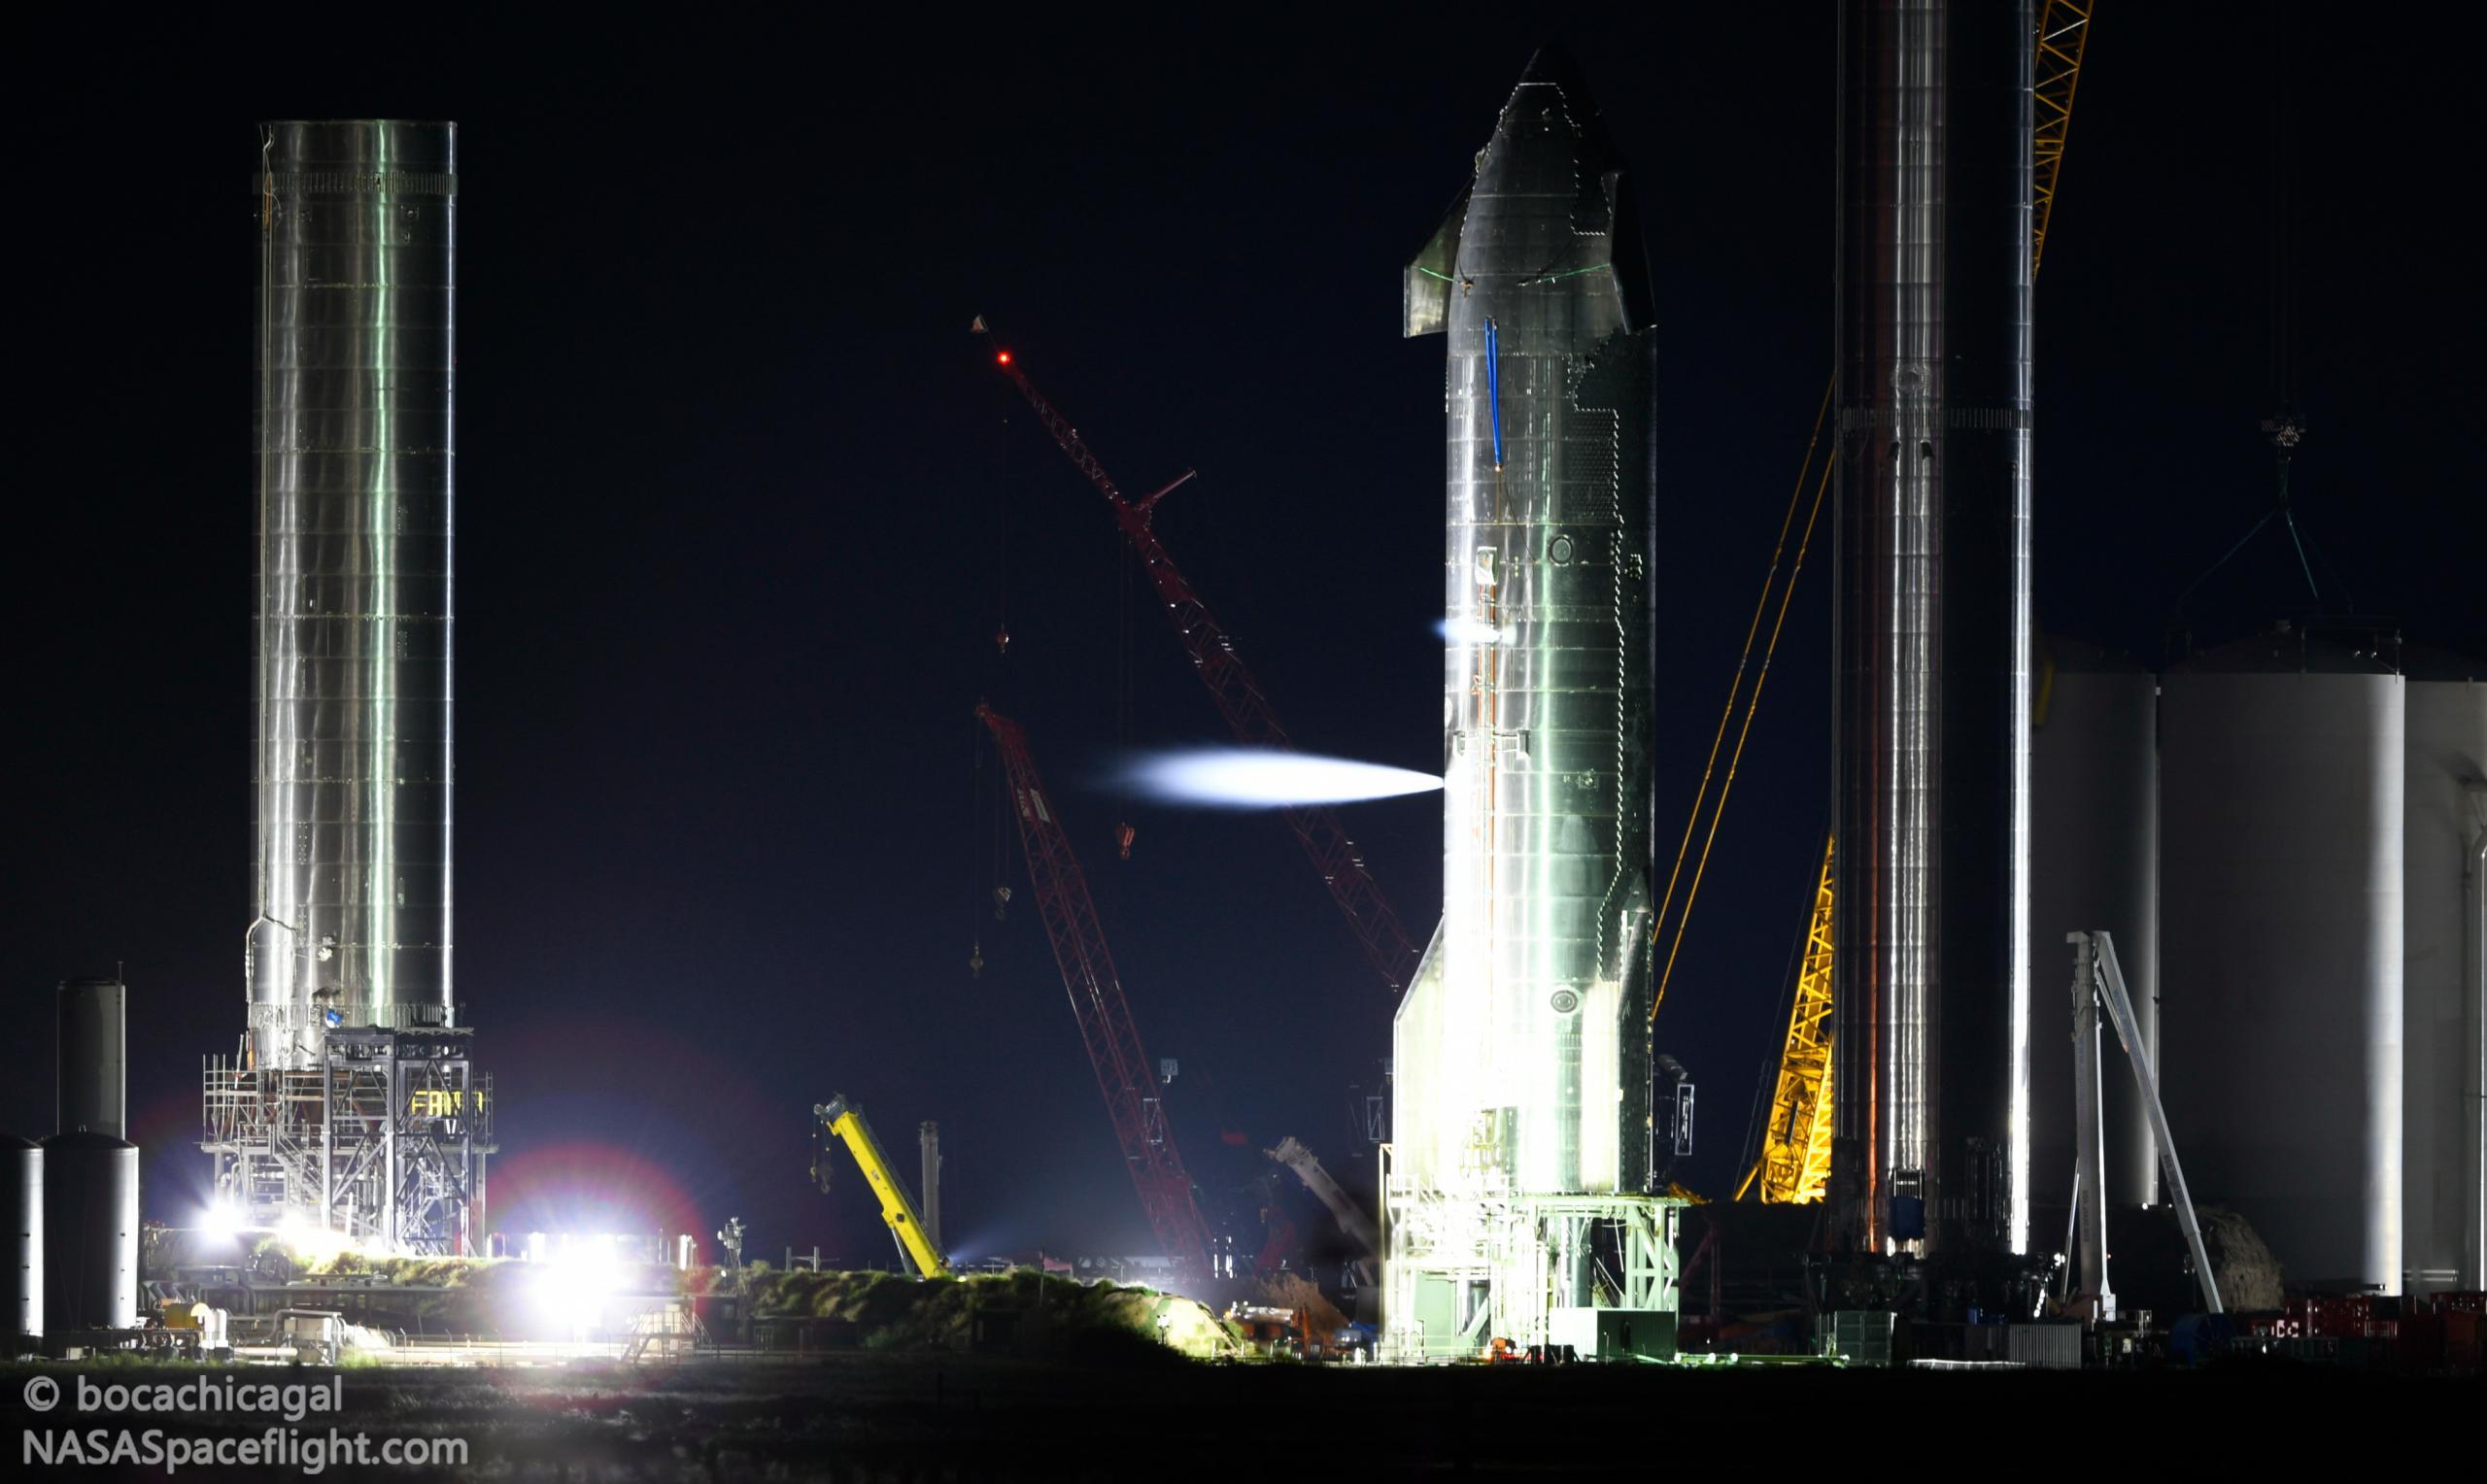 Starbase 092721 (NASASpaceflight – bocachicagal) S20 testing + B4 B3 + vent 1 crop 2 (c)